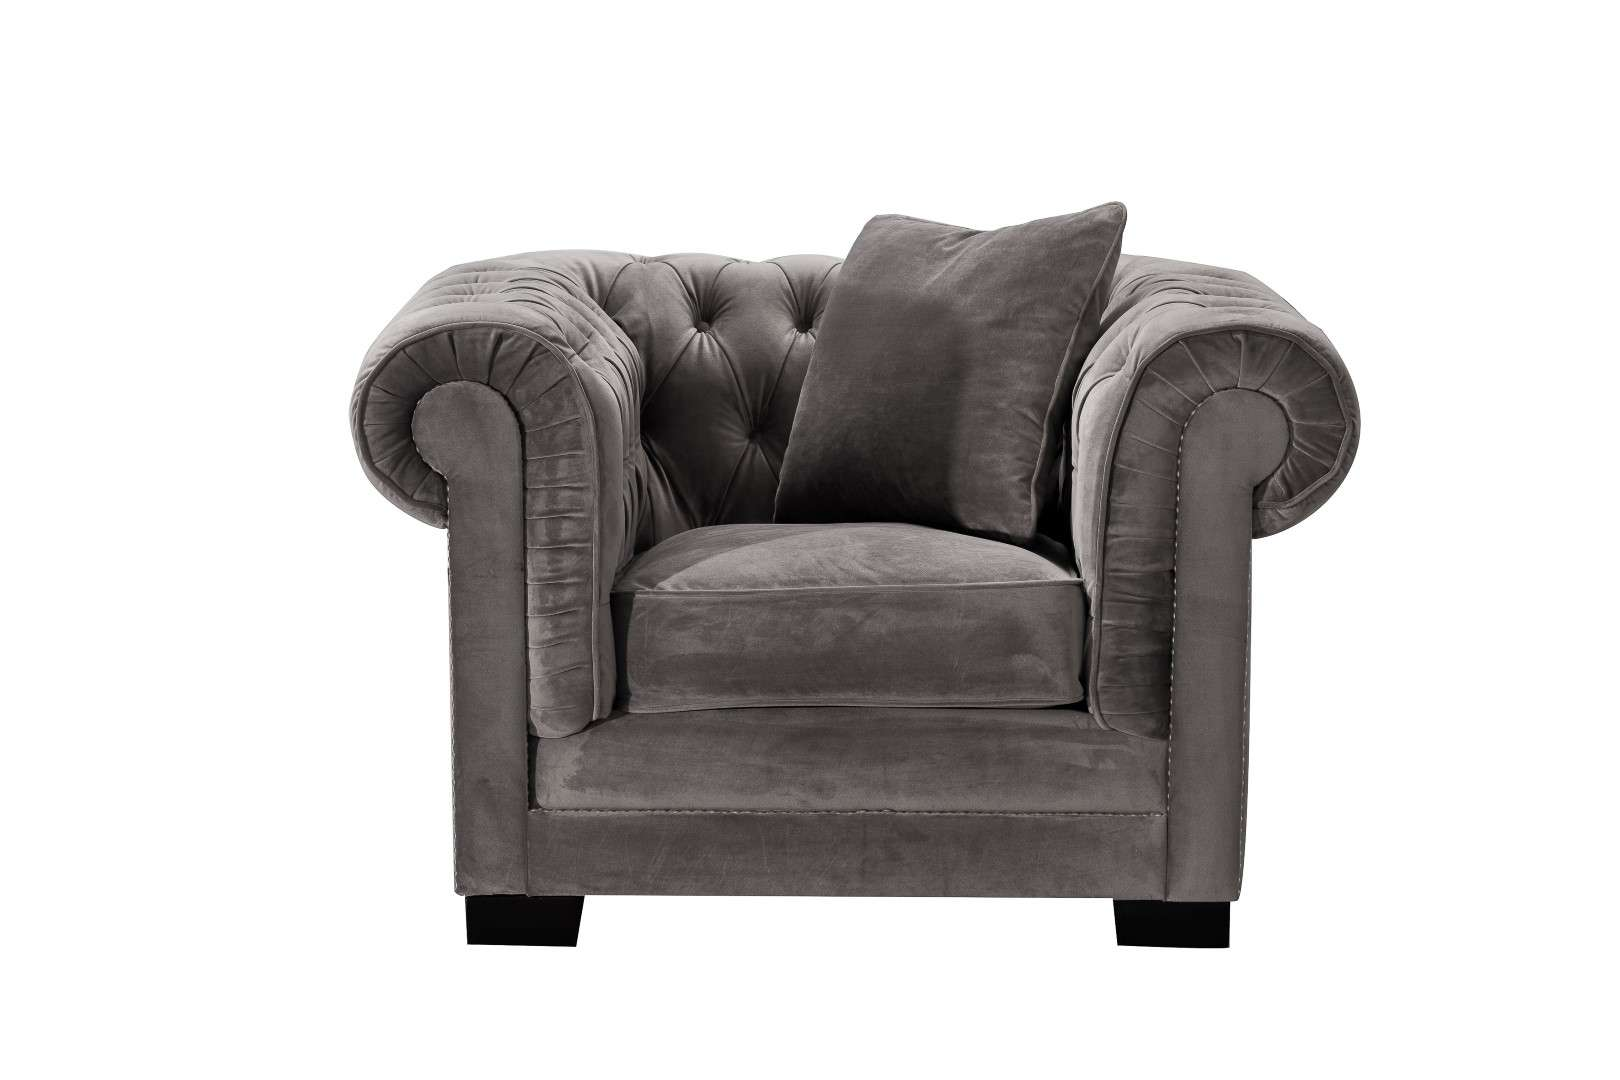 Fotel Chesterfield Classic Velvet Dark Grey 118x96x77cm 118x96x77cm